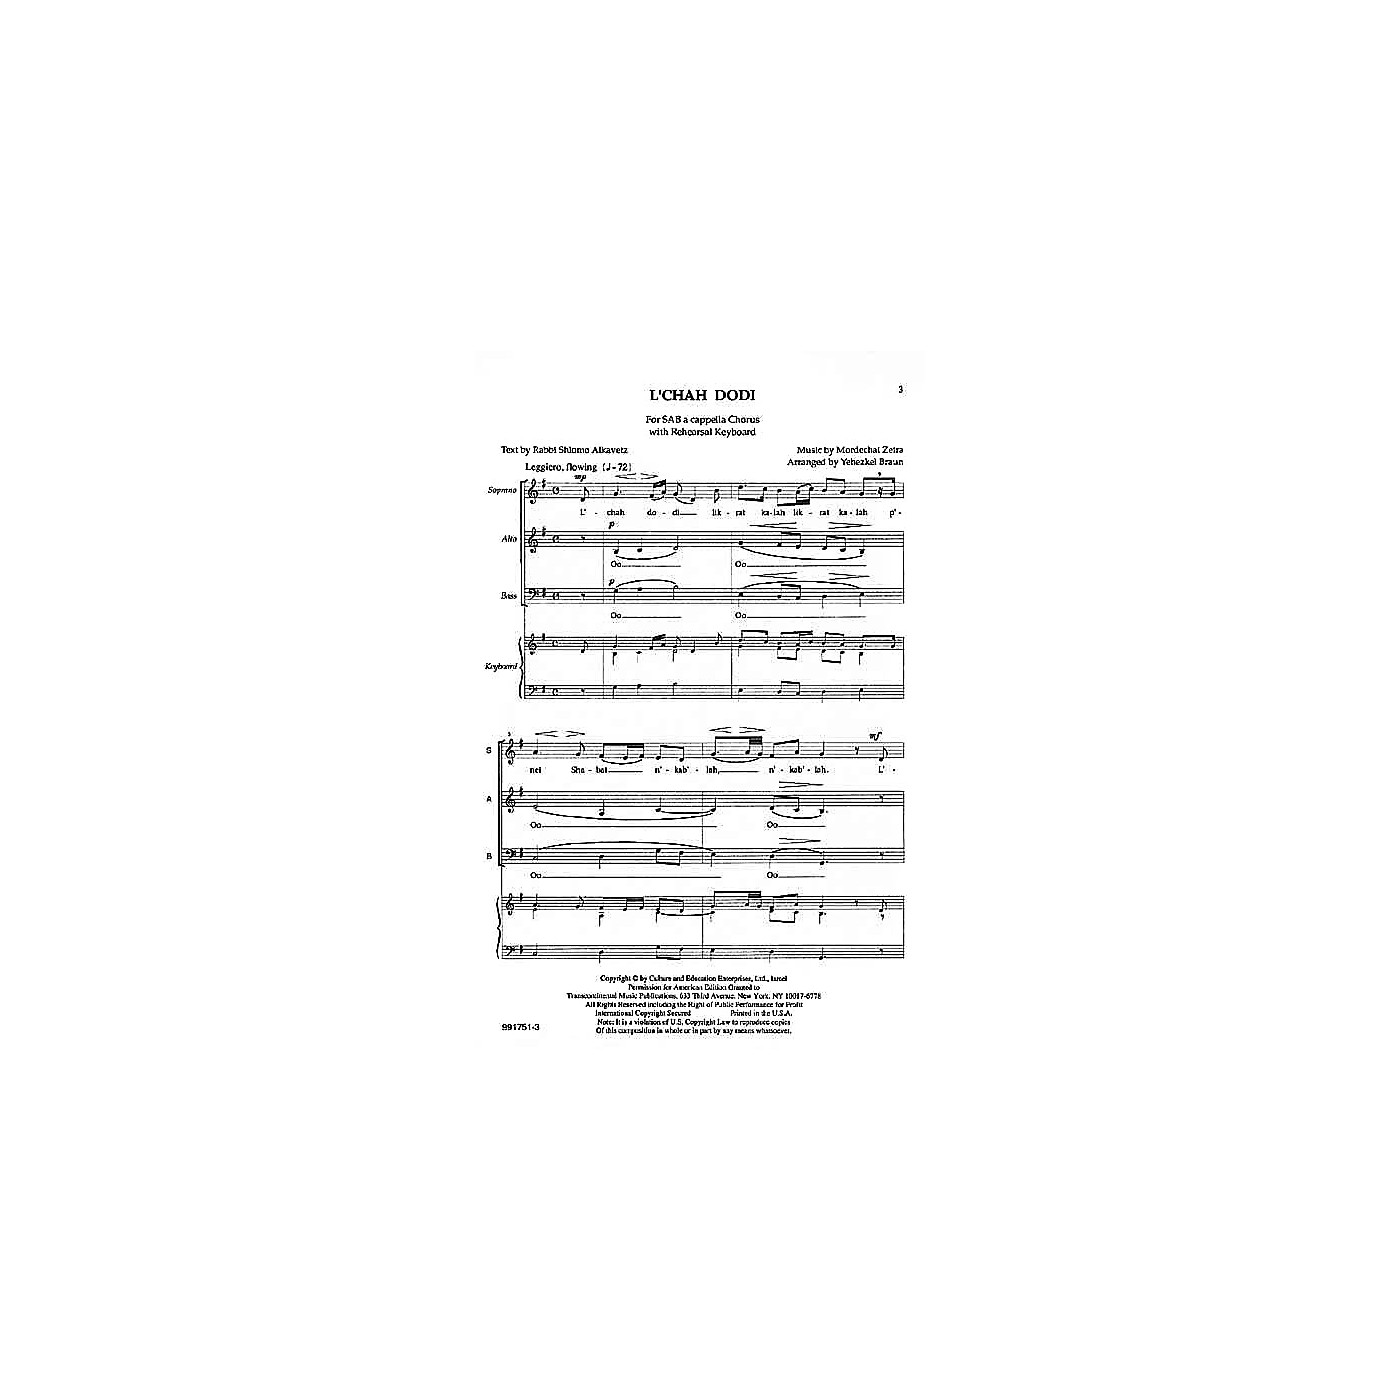 Transcontinental Music L'chah Dodi SAB arranged by Yehezkel Braun thumbnail